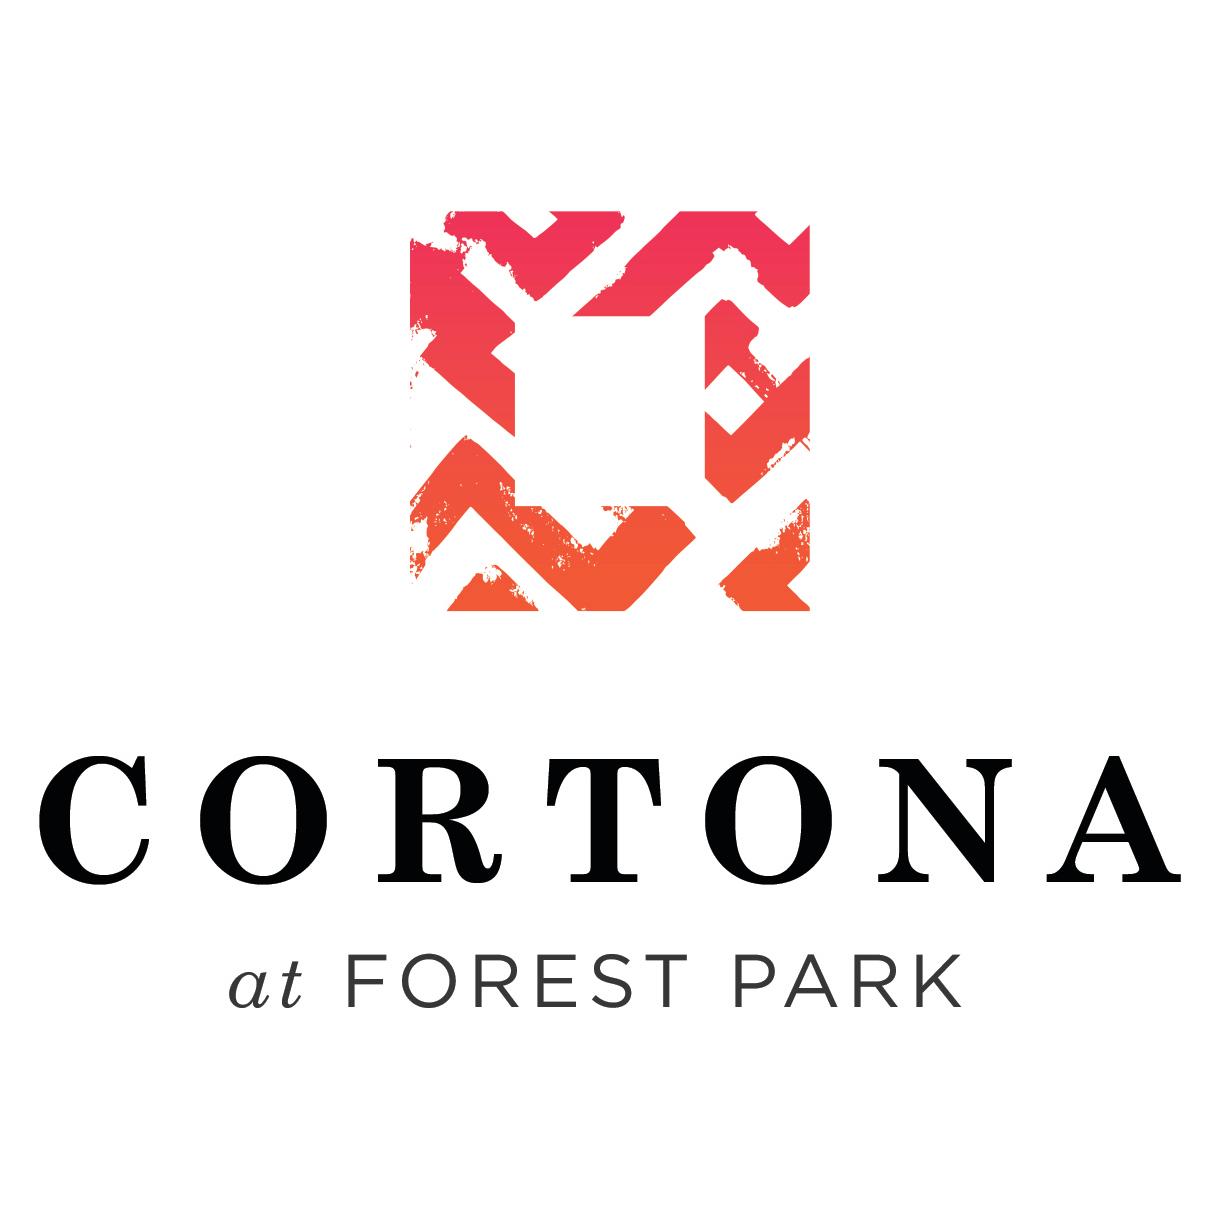 Cortona at Forest Park